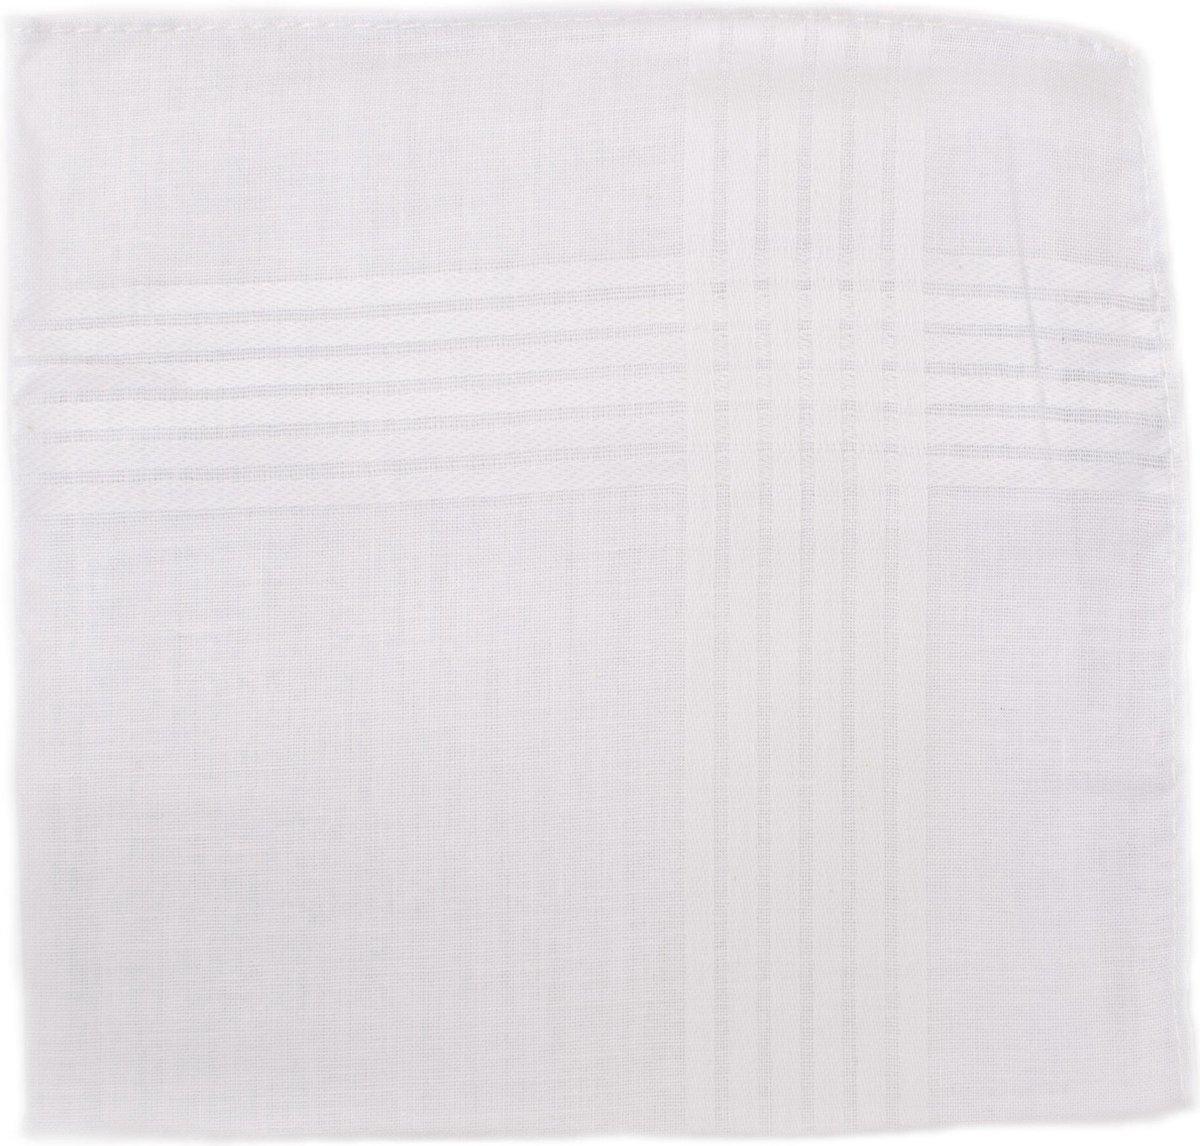 Zakdoek - 6 katoenen zakdoeken - Heren zakdoeken - Witte zakdoeken - 100% katoen - 40x40 cm